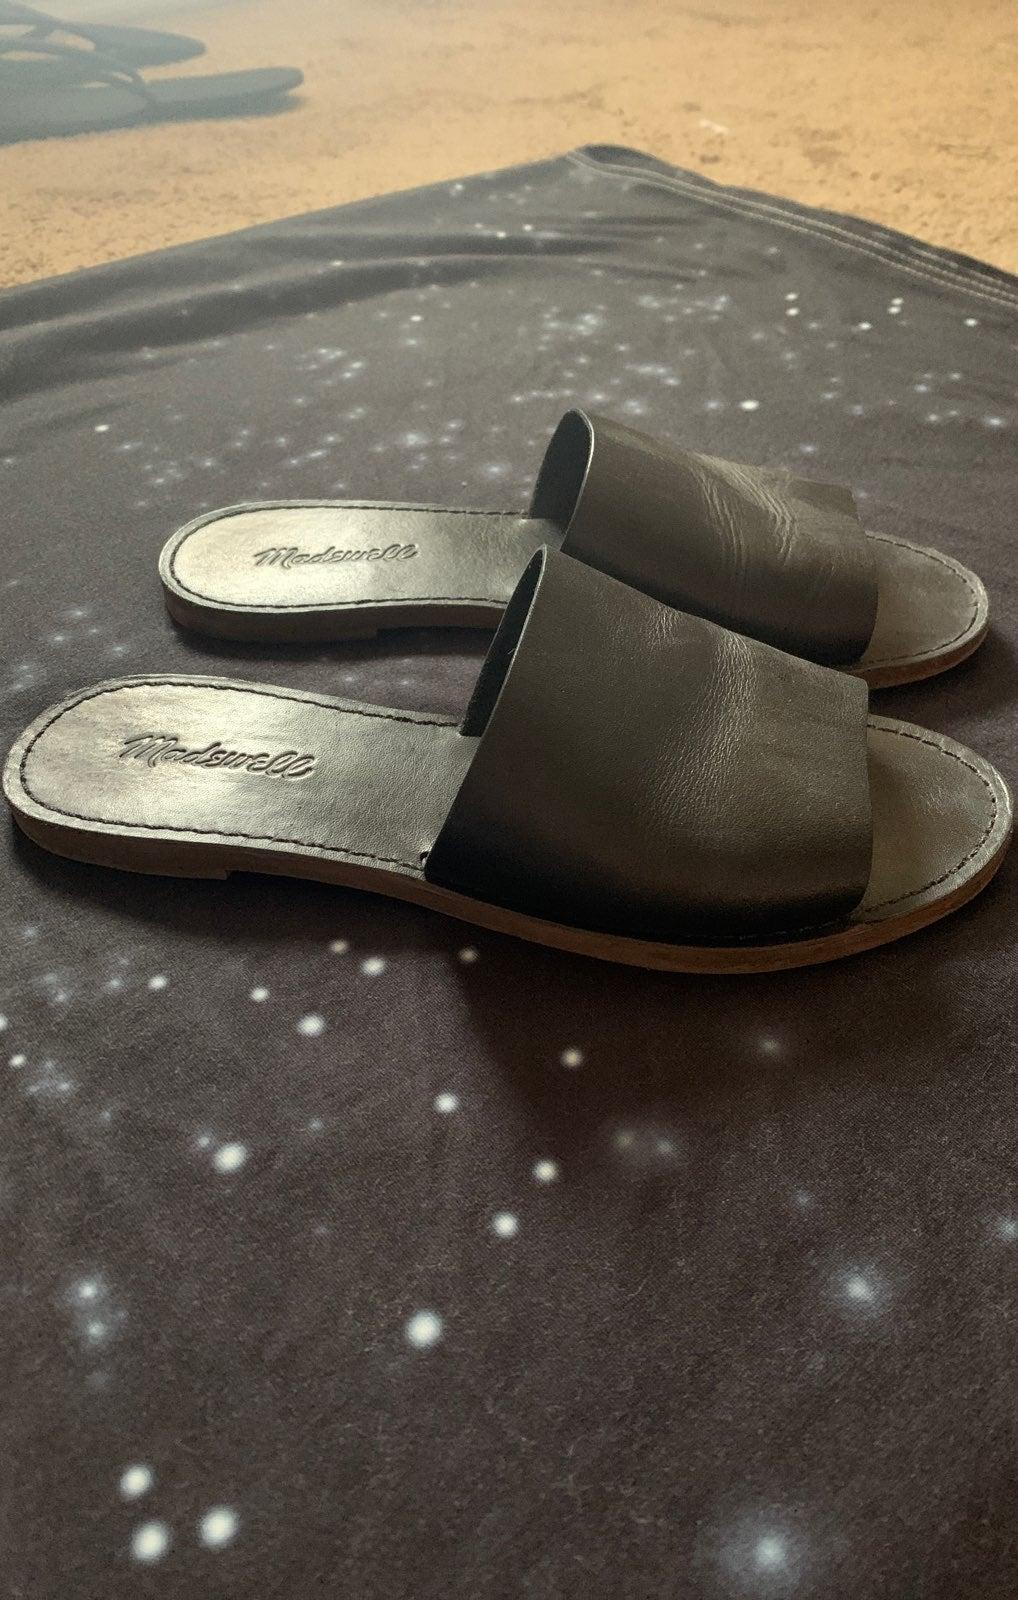 Madewell flat sandals, black